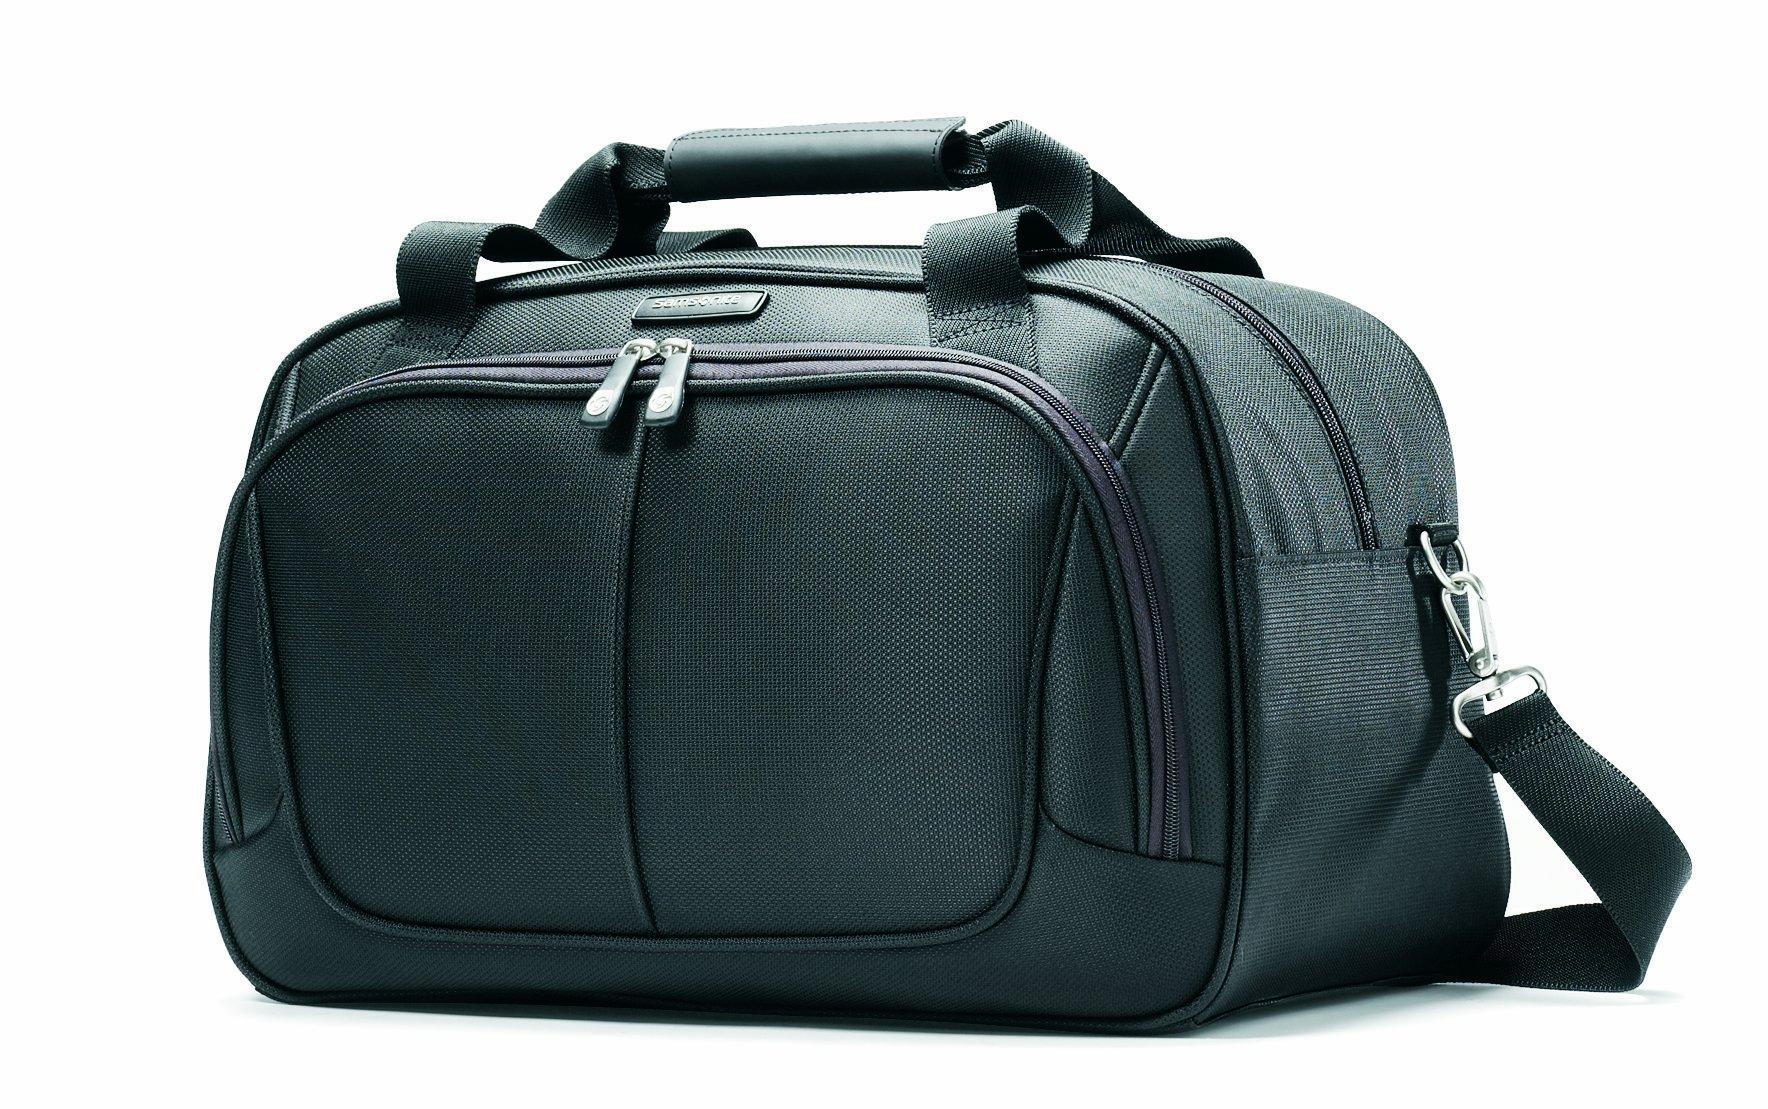 Samsonite Luggage Hyperspace Boarding Bag, Galaxy Black, One Size